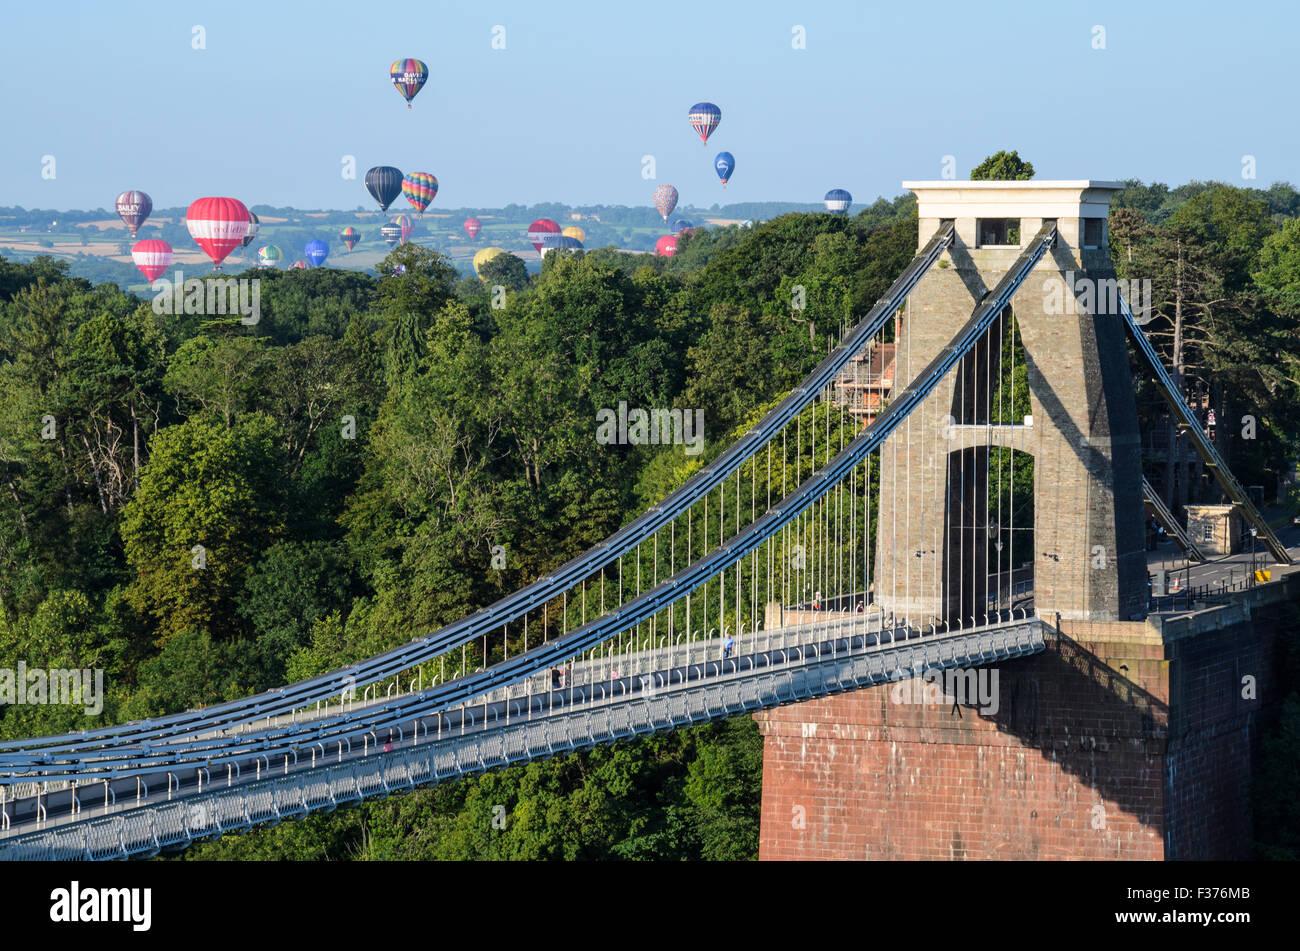 The Bristol International Balloon Fiesta seen over the Clifton Suspension Bridge - Stock Image